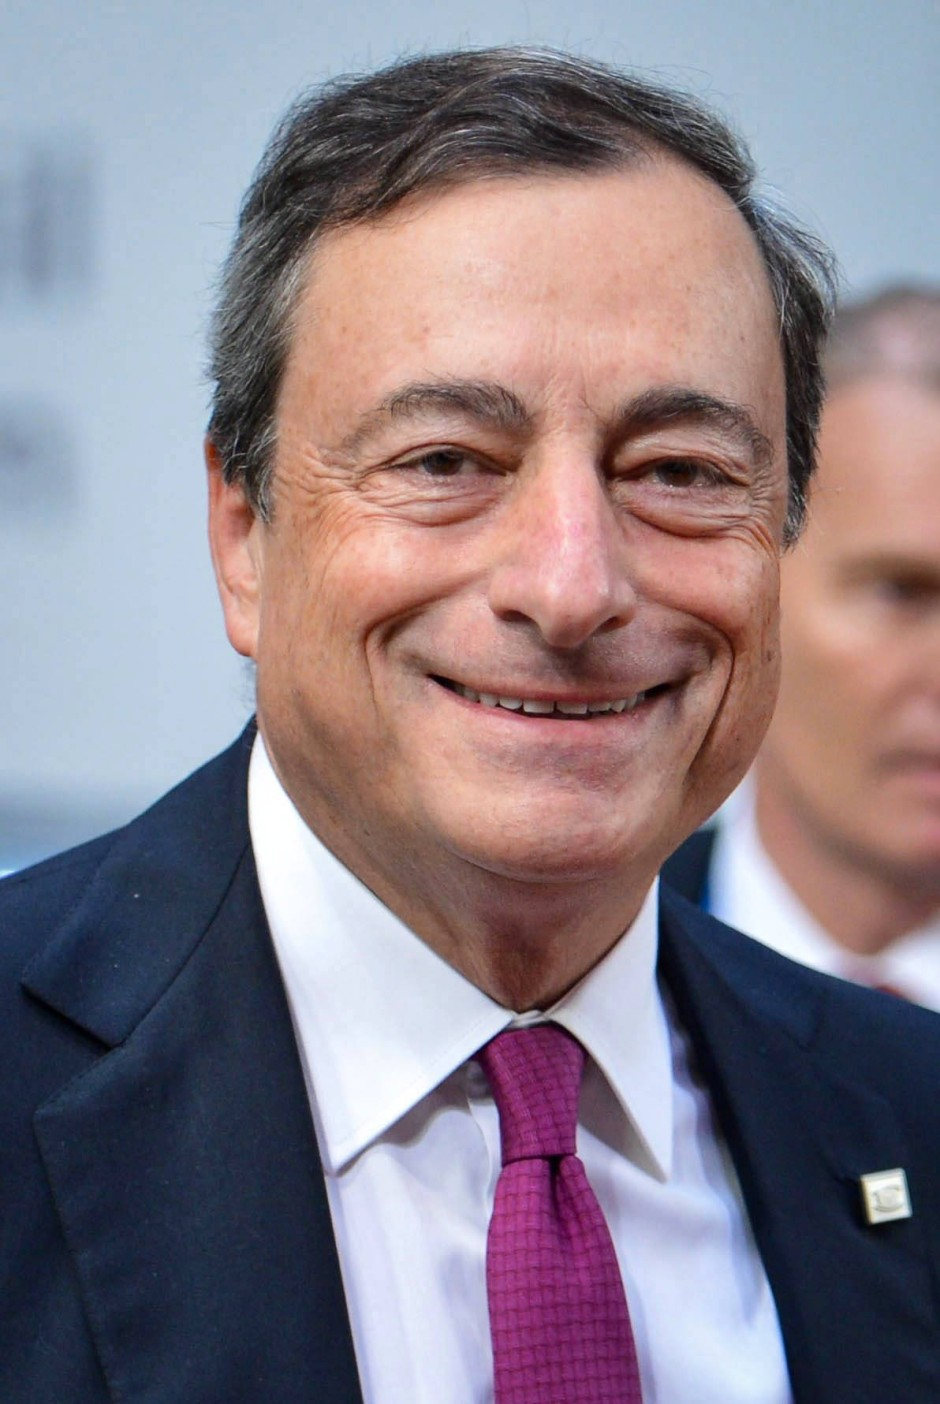 dpa. Mario Draghi